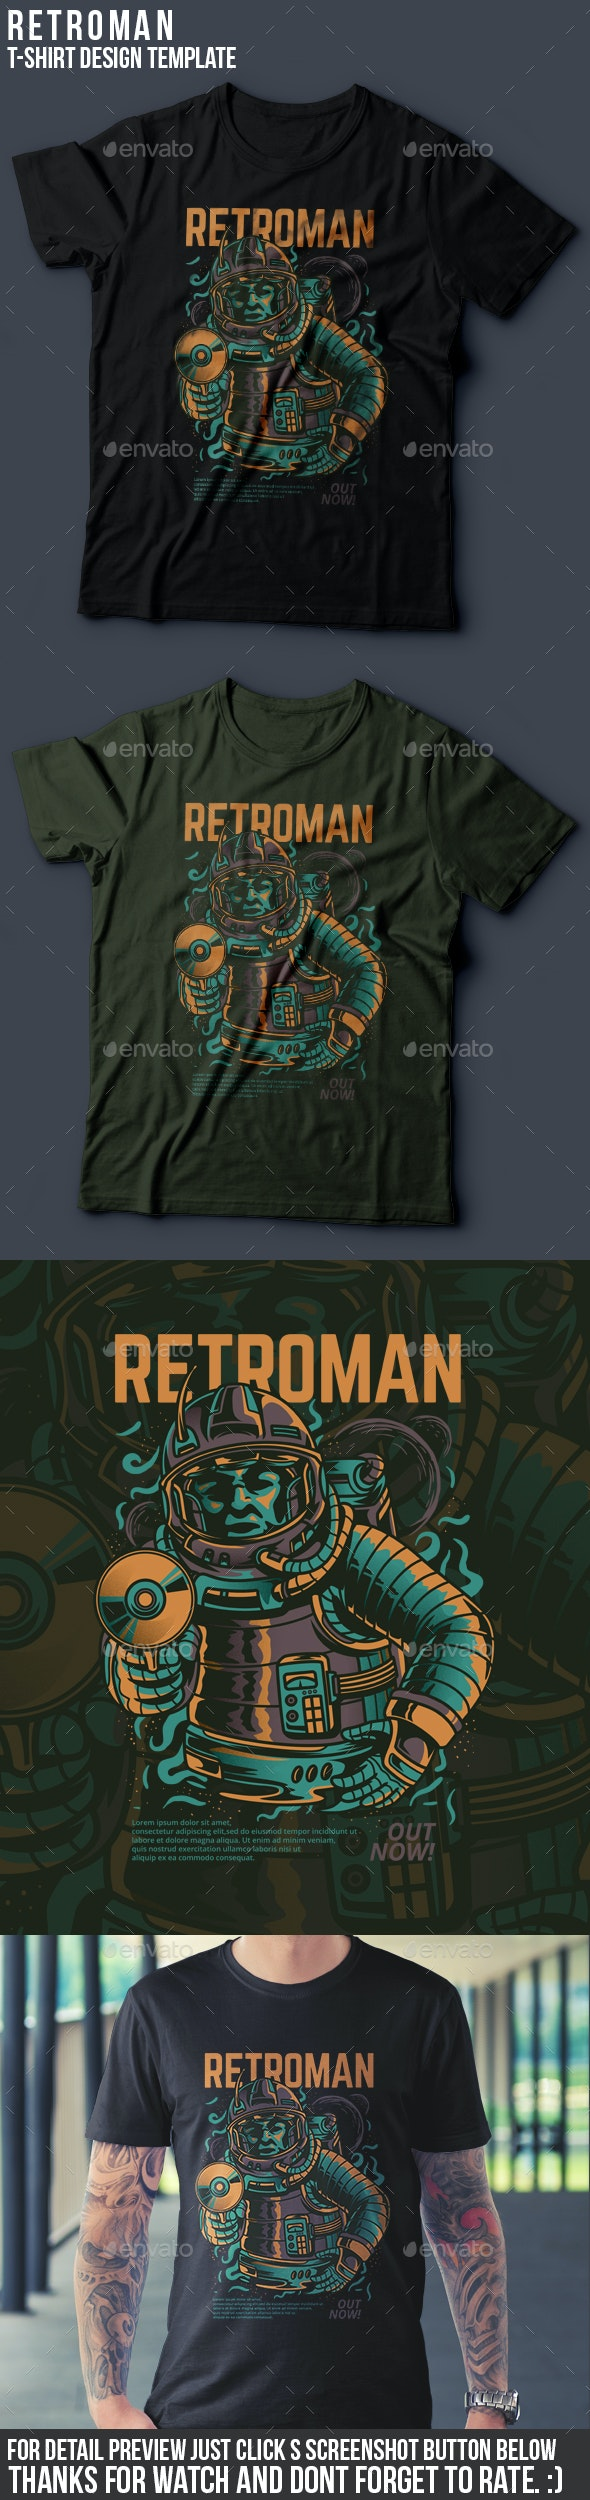 Retroman T-Shirt Design - Grunge Designs